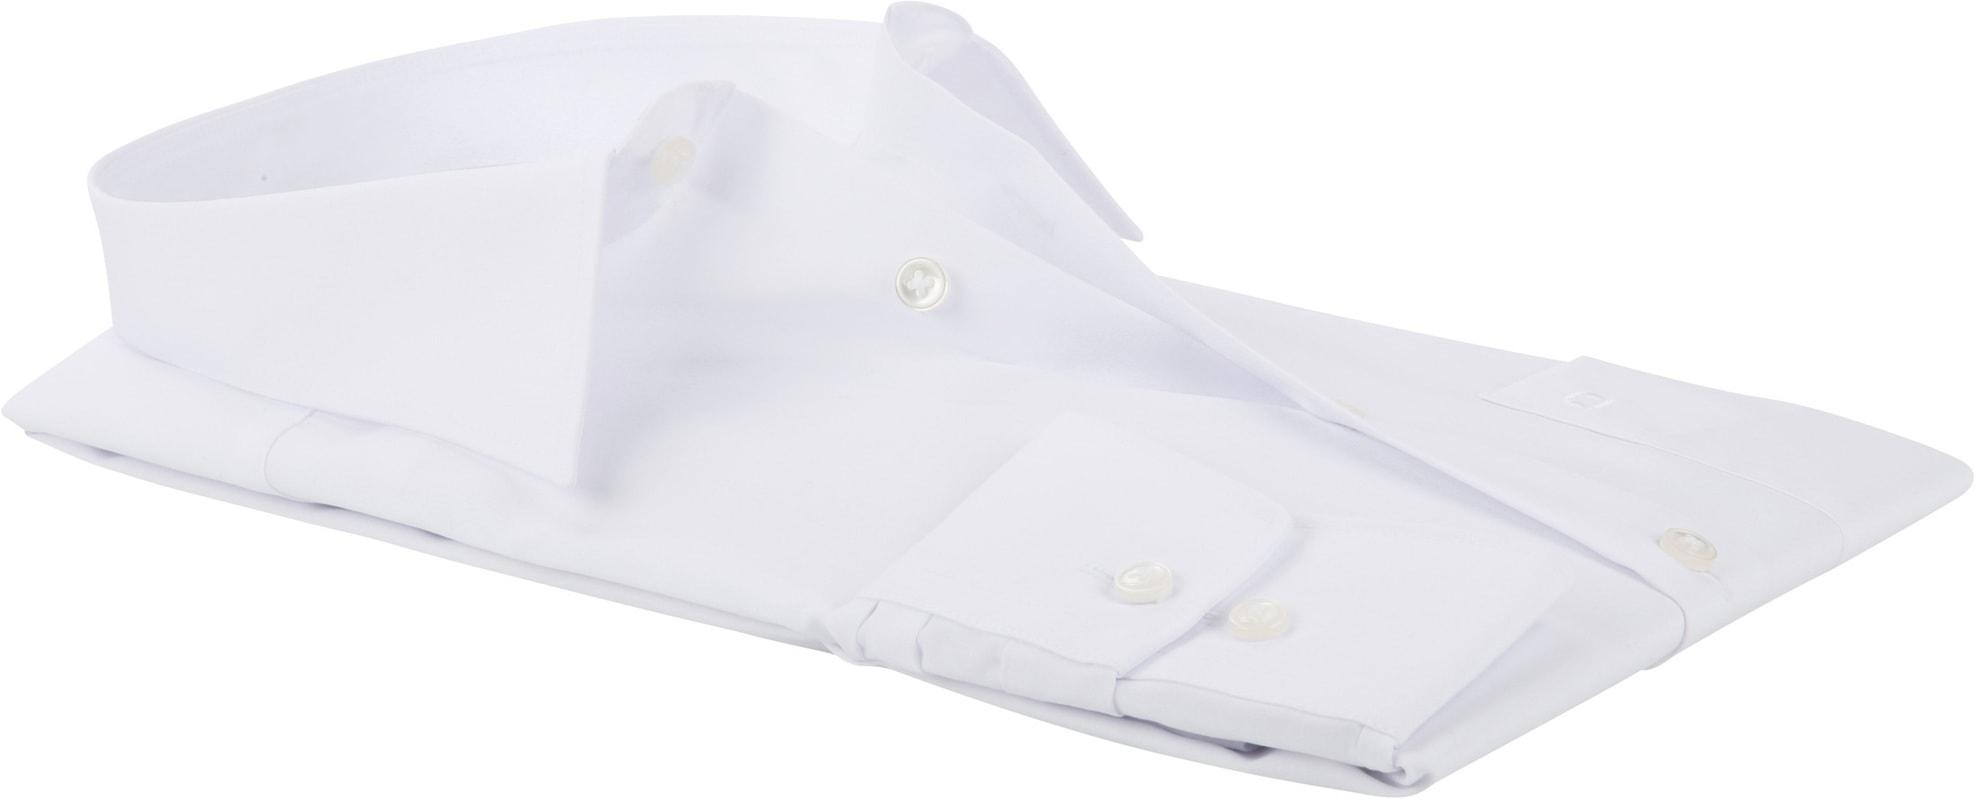 OLYMP Luxor CF Overhemd Wit SL7 - Wit maat 44